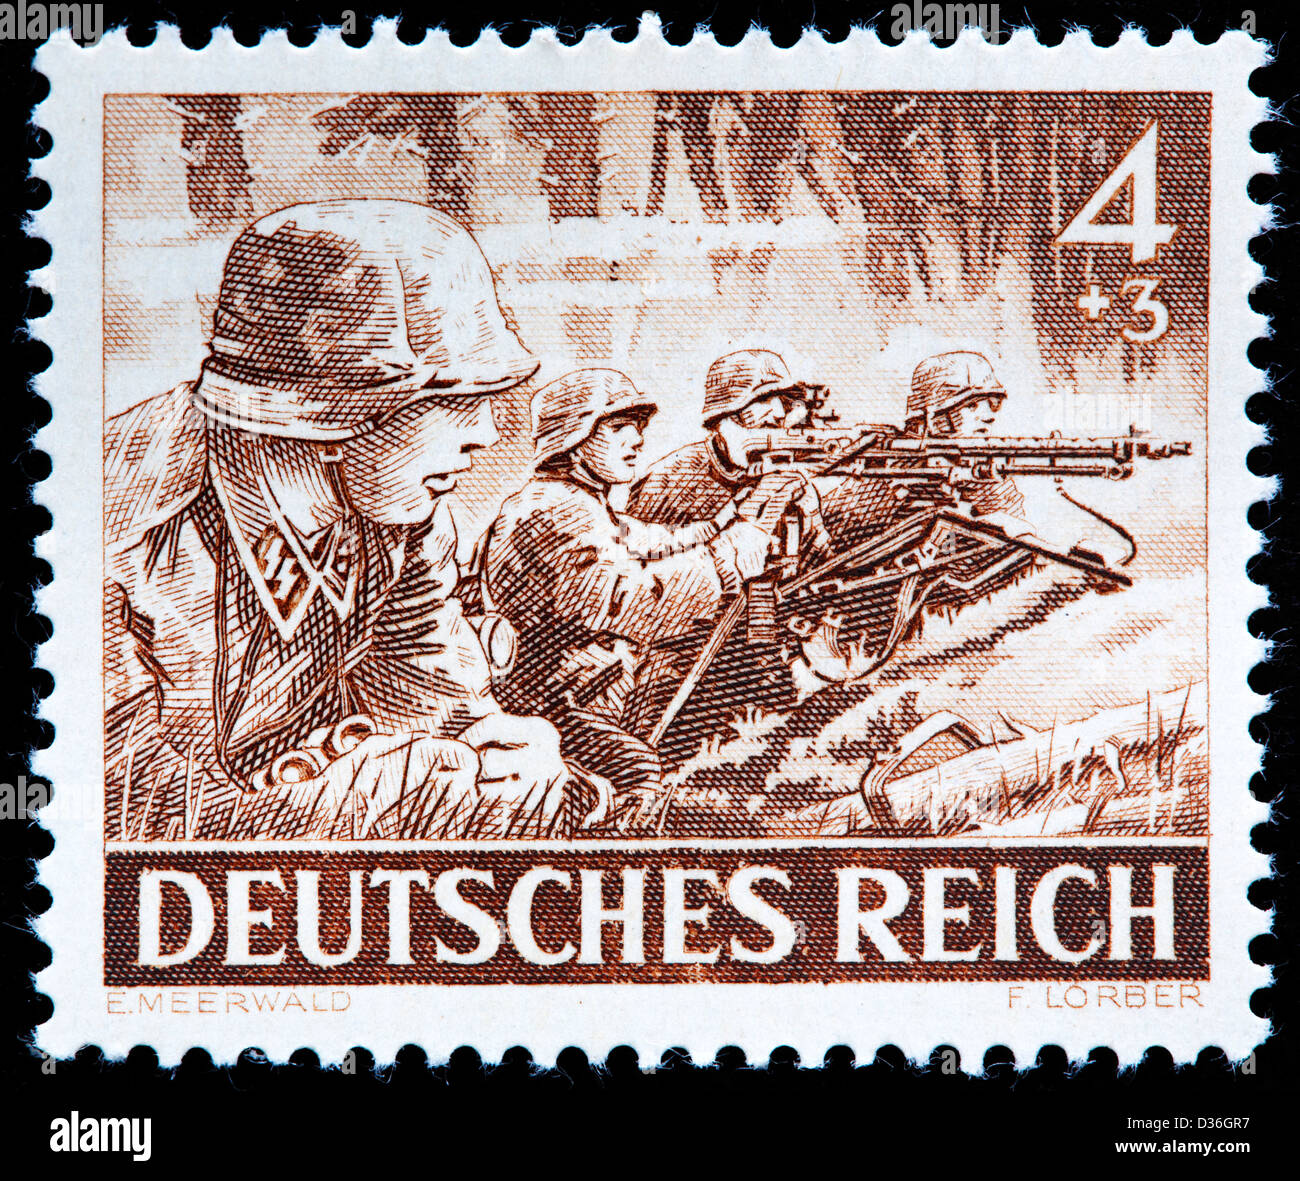 Schutz-Staffel Troops (SS), postage stamp, Germany, 1943 - Stock Image